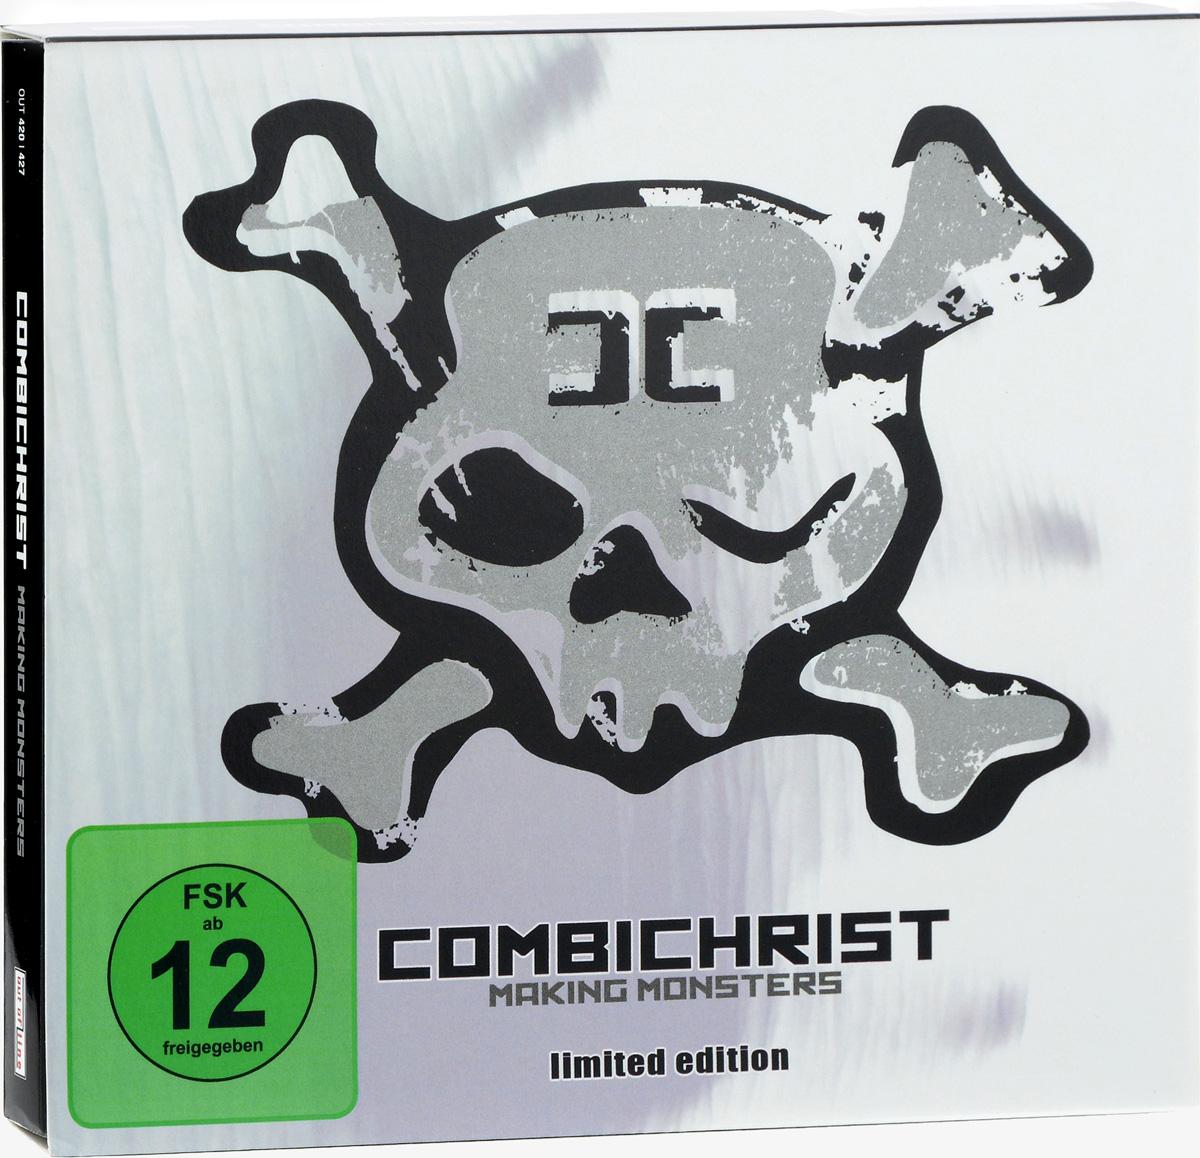 Combichrist Combichrist. Making Monsters. Limited Edition (CD + DVD) vier promille ein letzter gruss live in leipzig 2007 dvd 2 cd